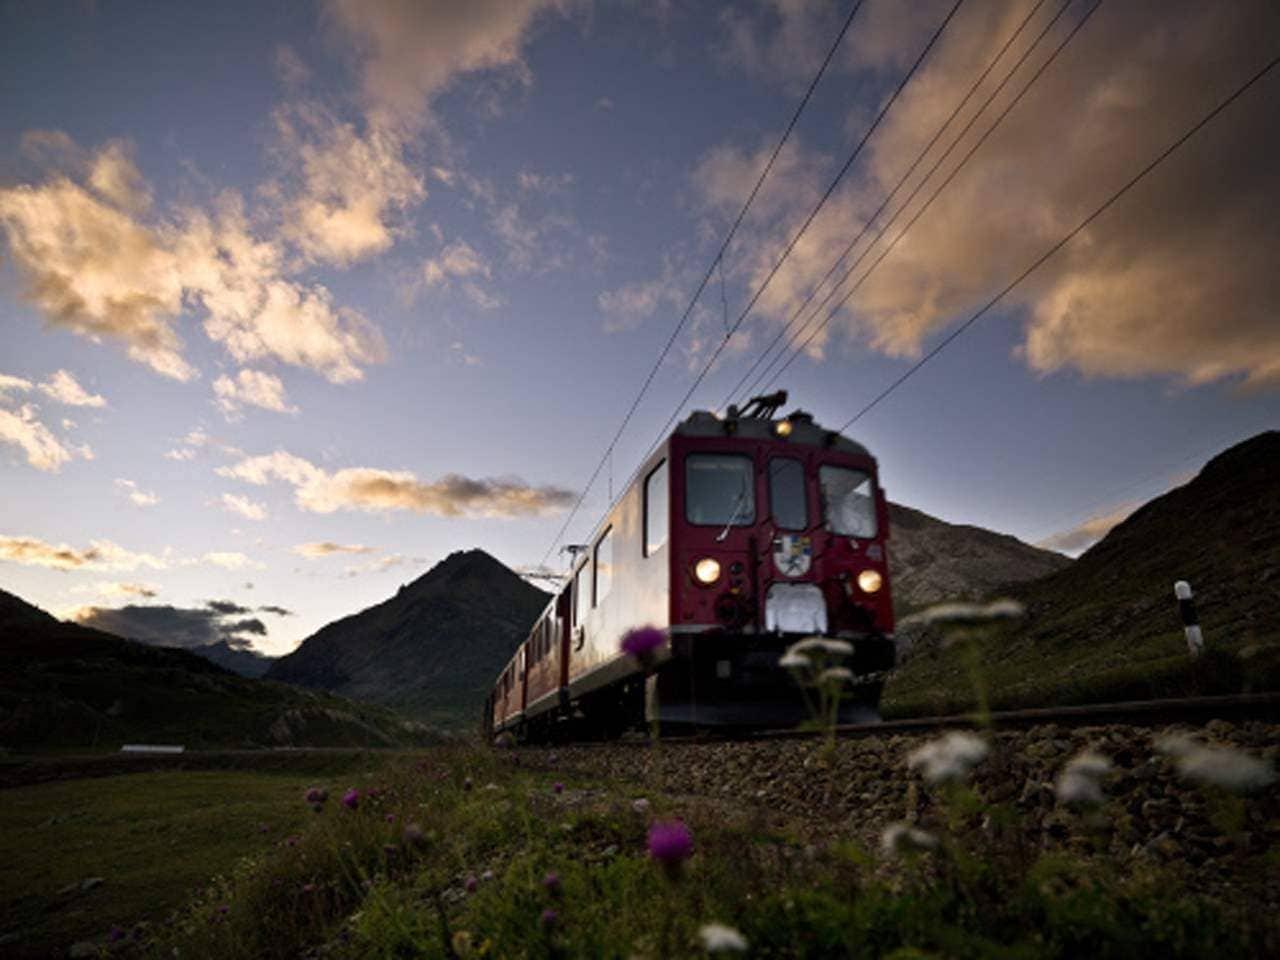 Ausflug: Wandern auf der Via Albula/Bernina – Entlang dem UNESCO Welterbe